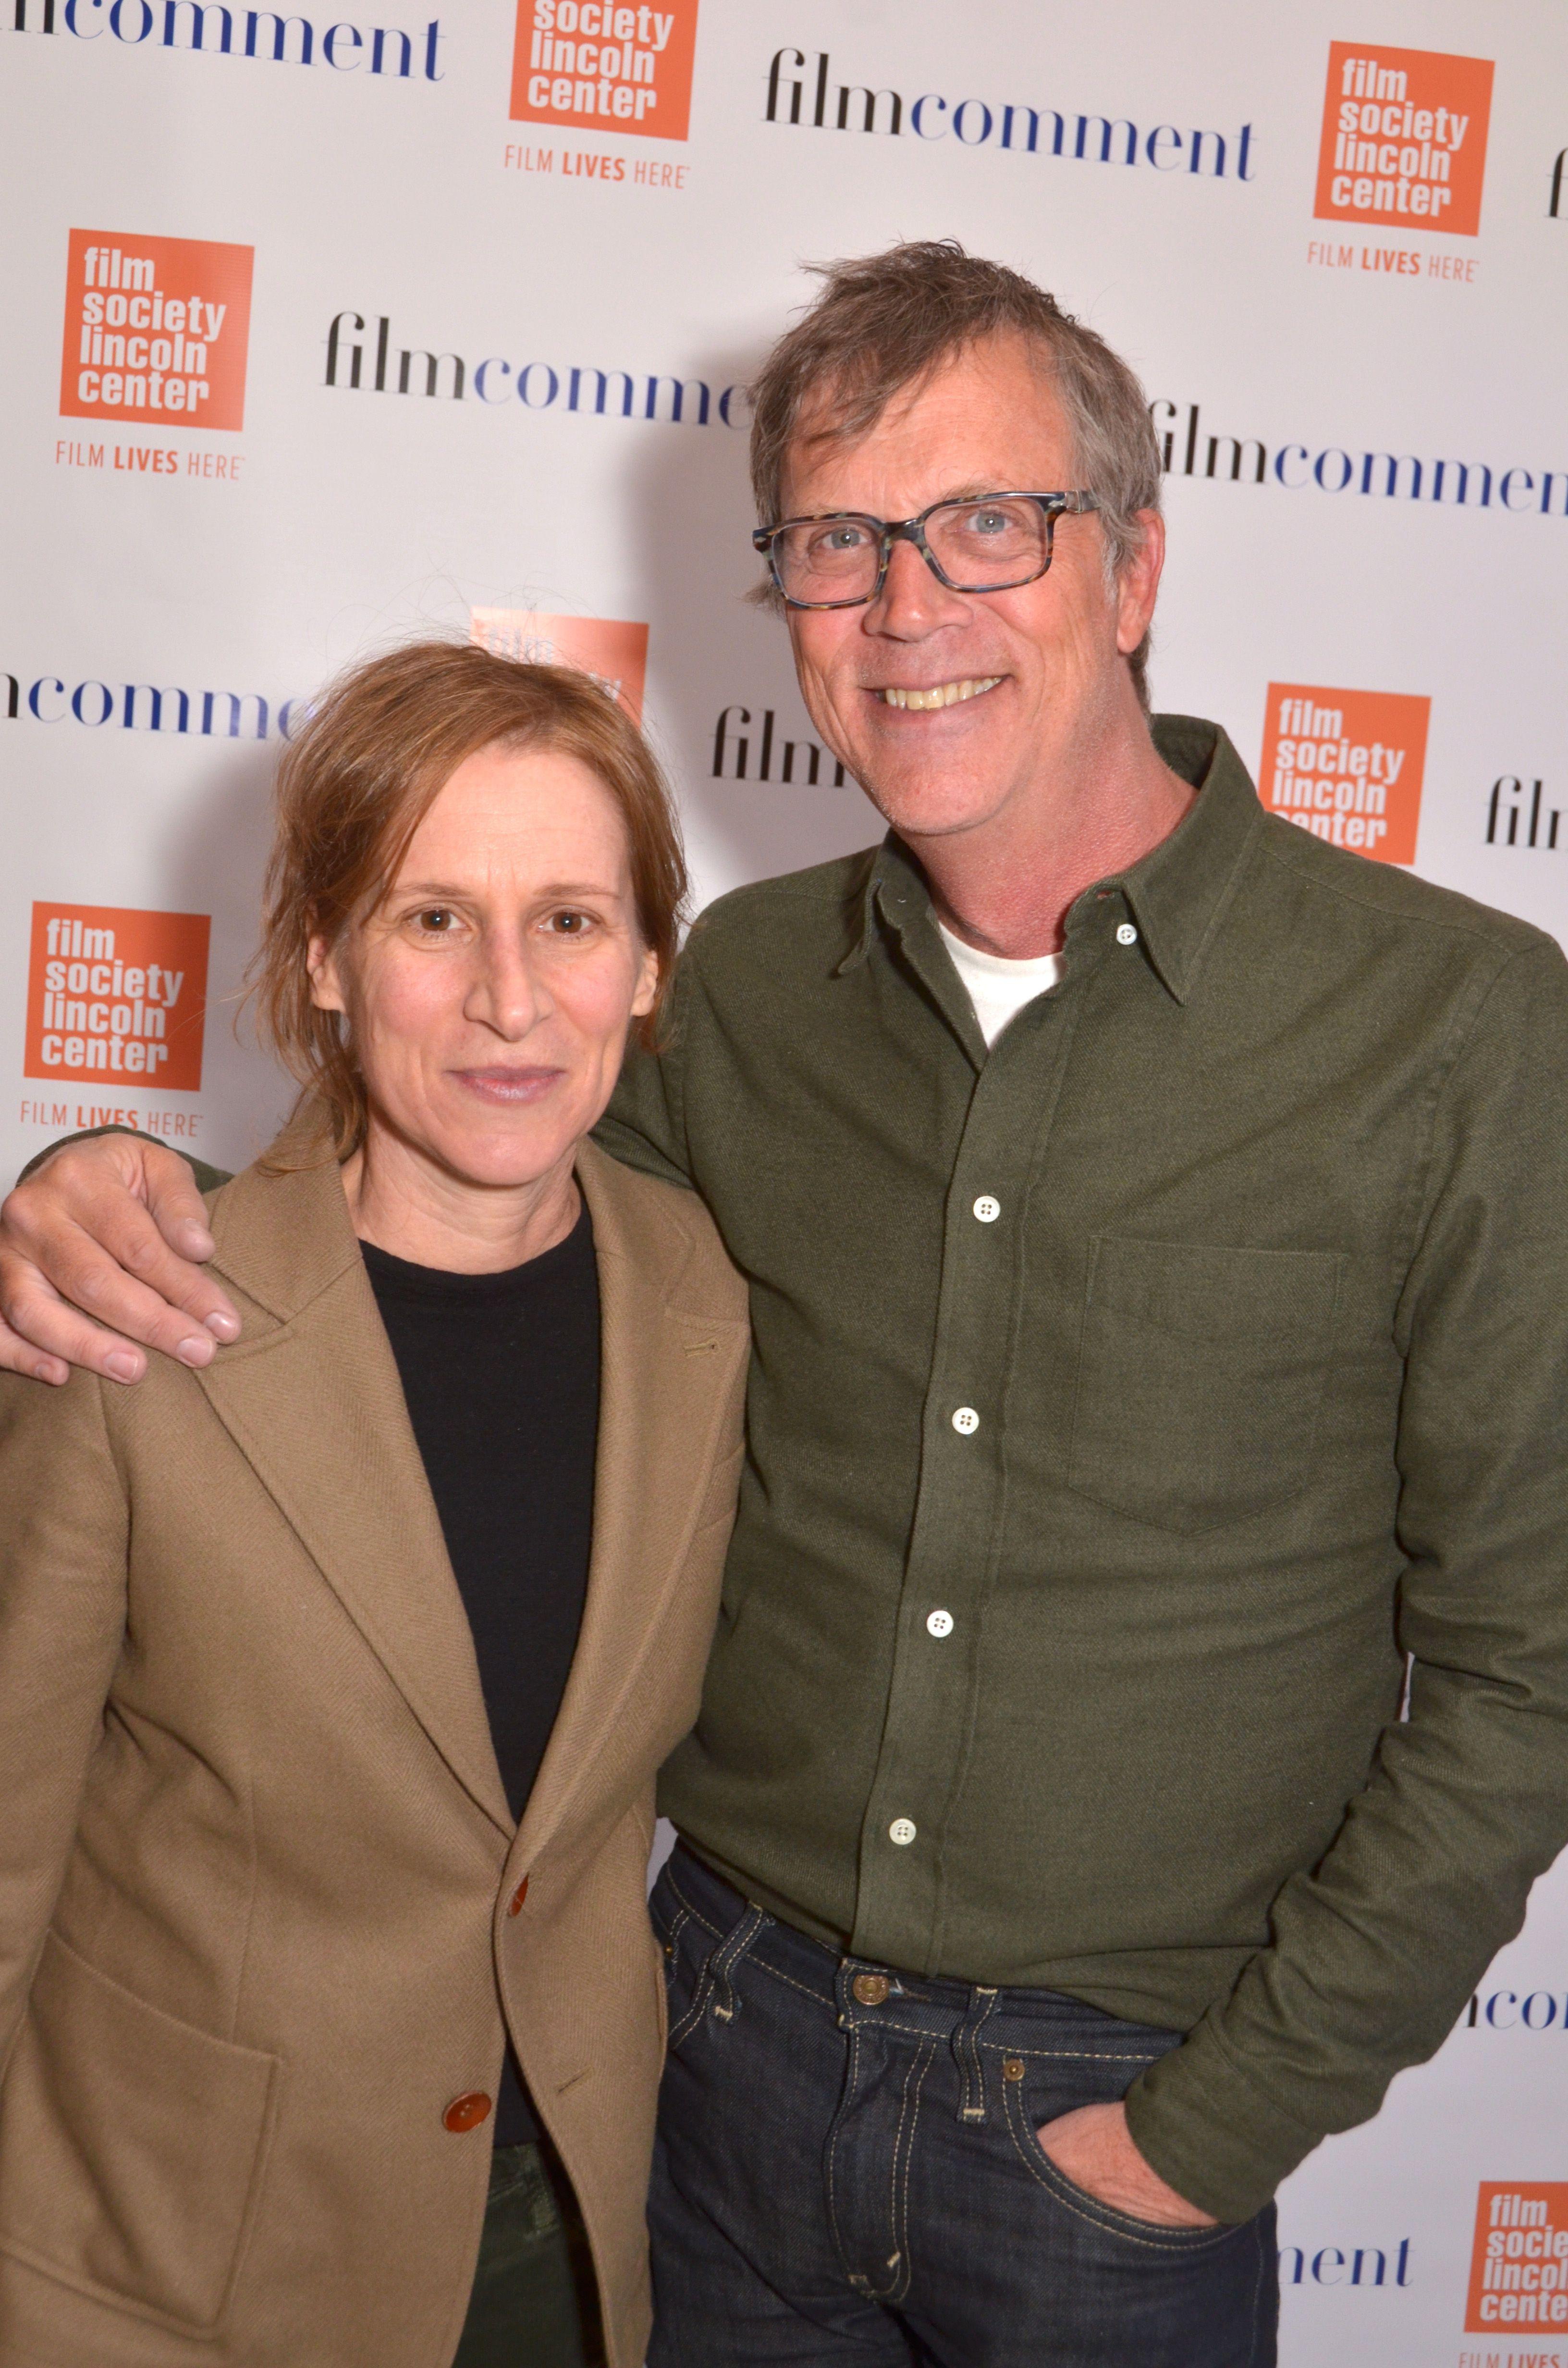 Directors Kelly Reichardt and Todd Haynes